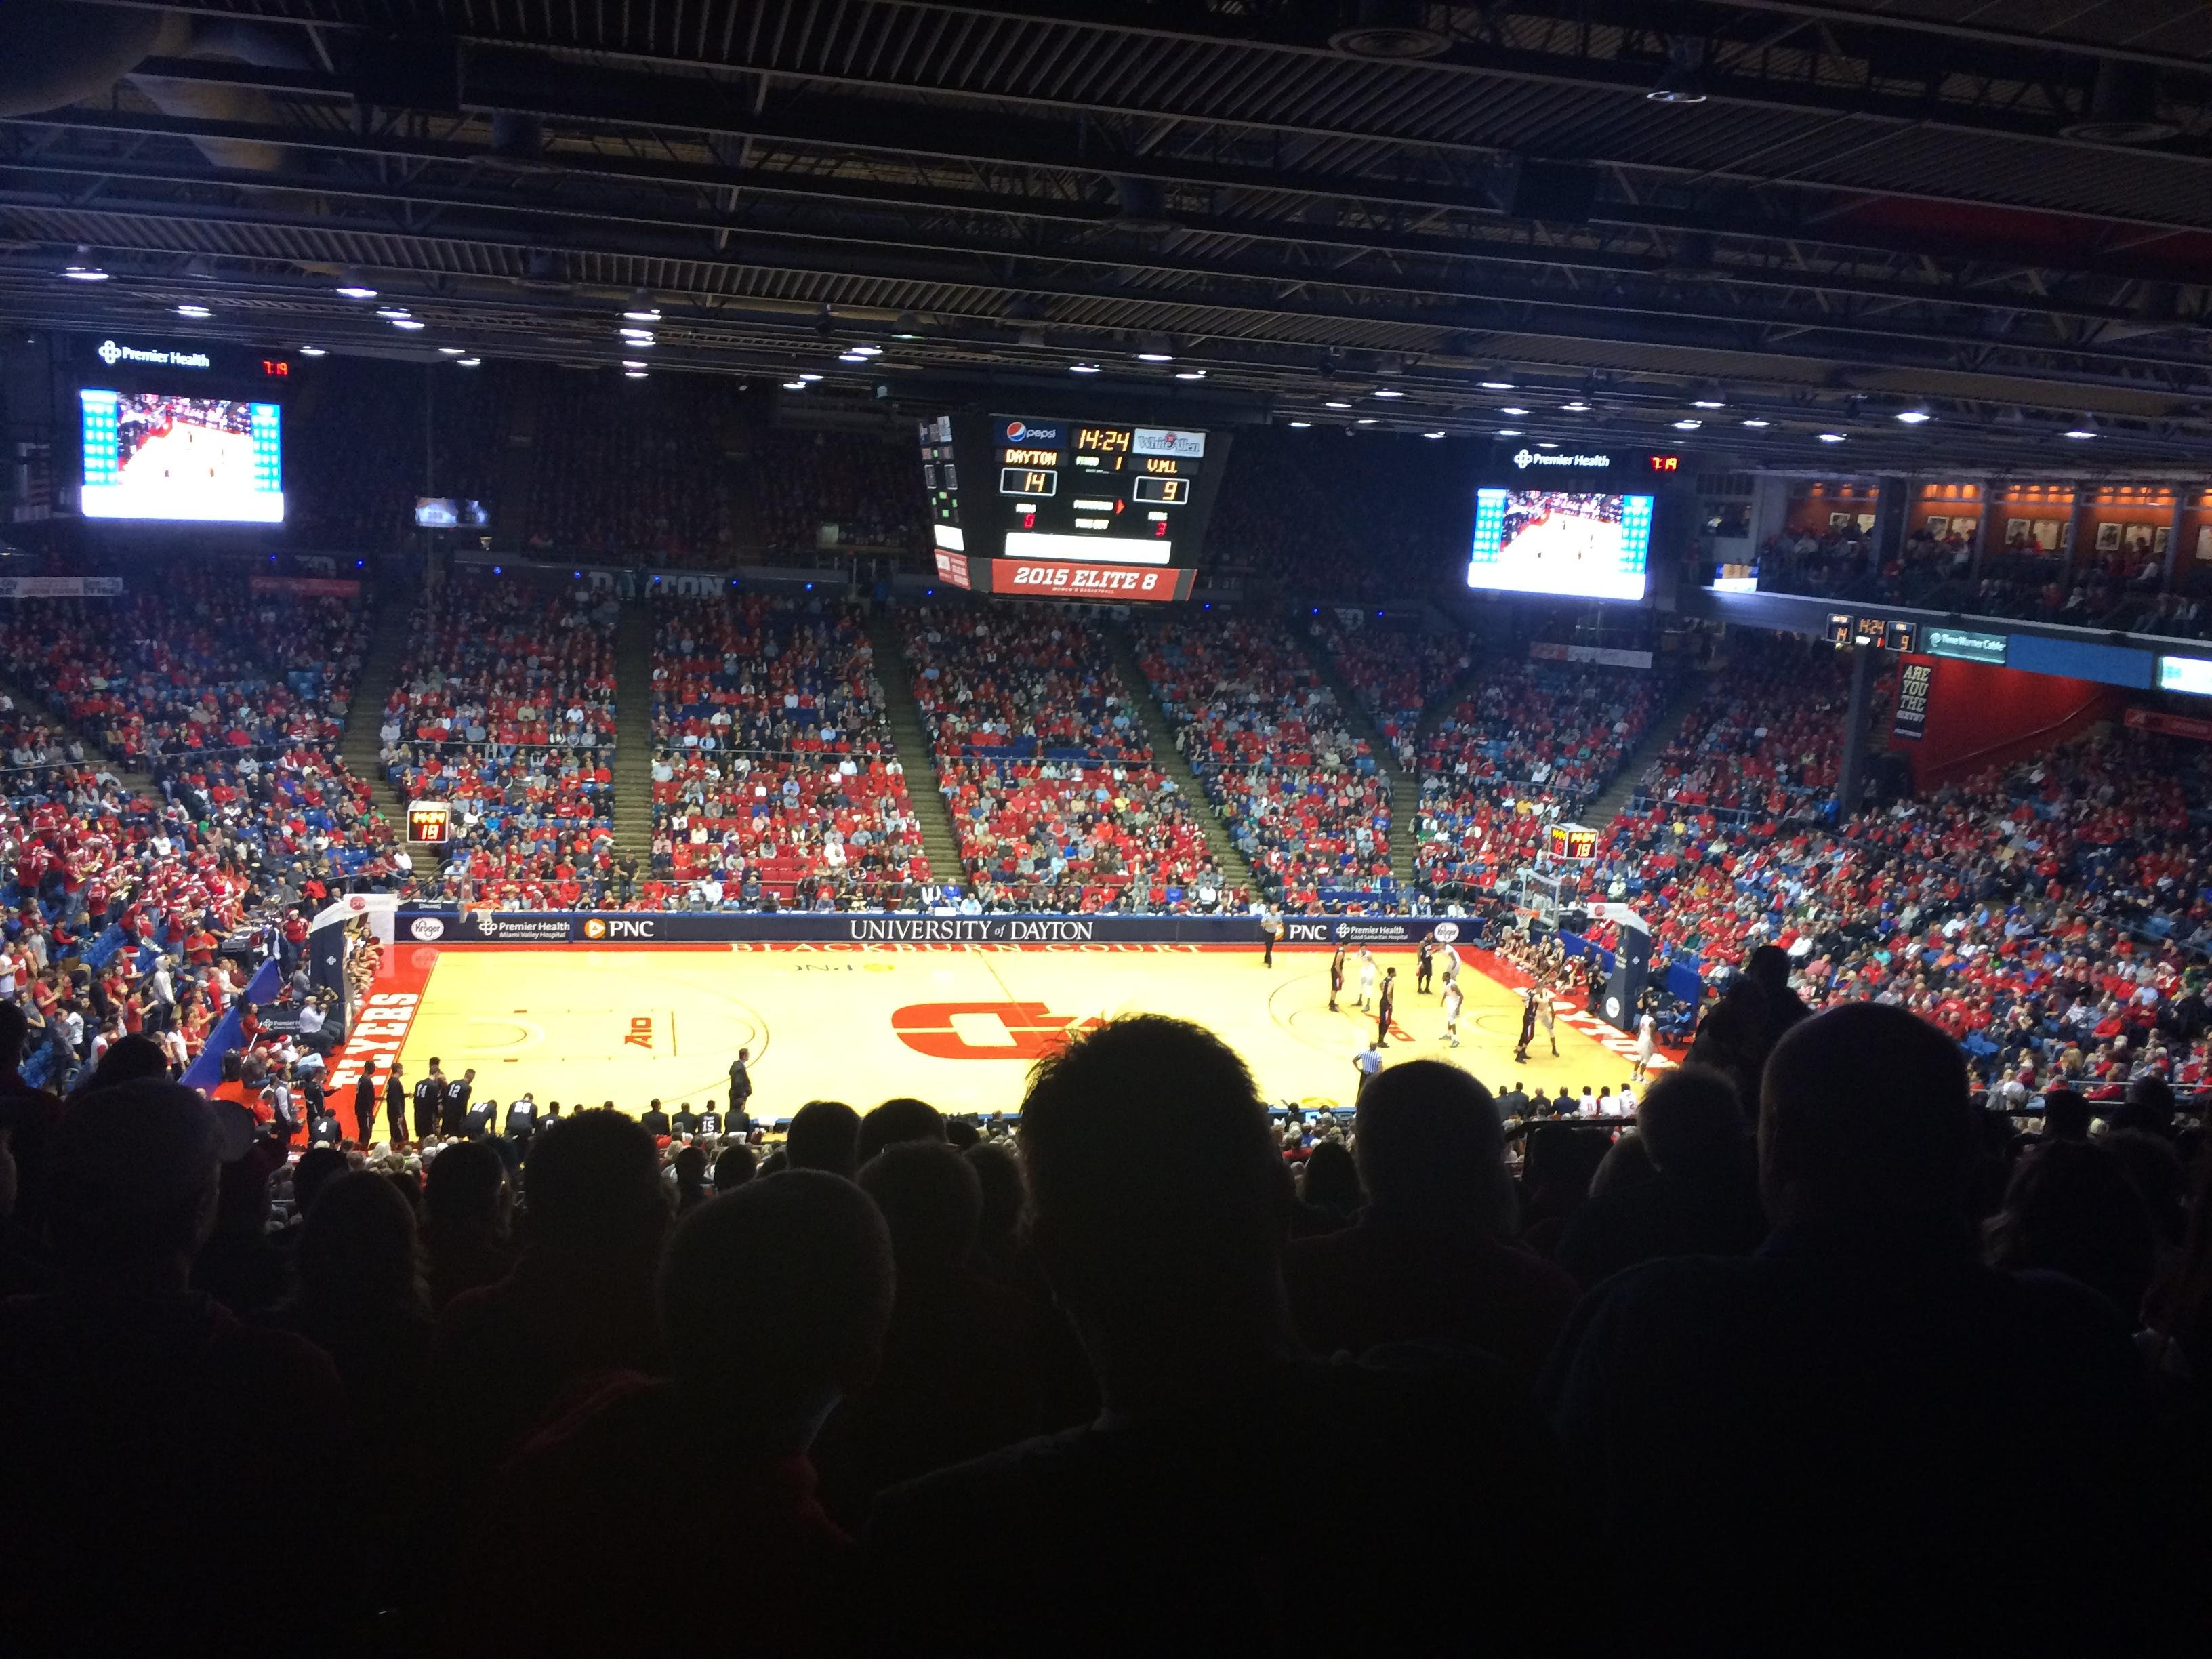 University of Dayton Arena Secção 310 Fila K Lugar 9